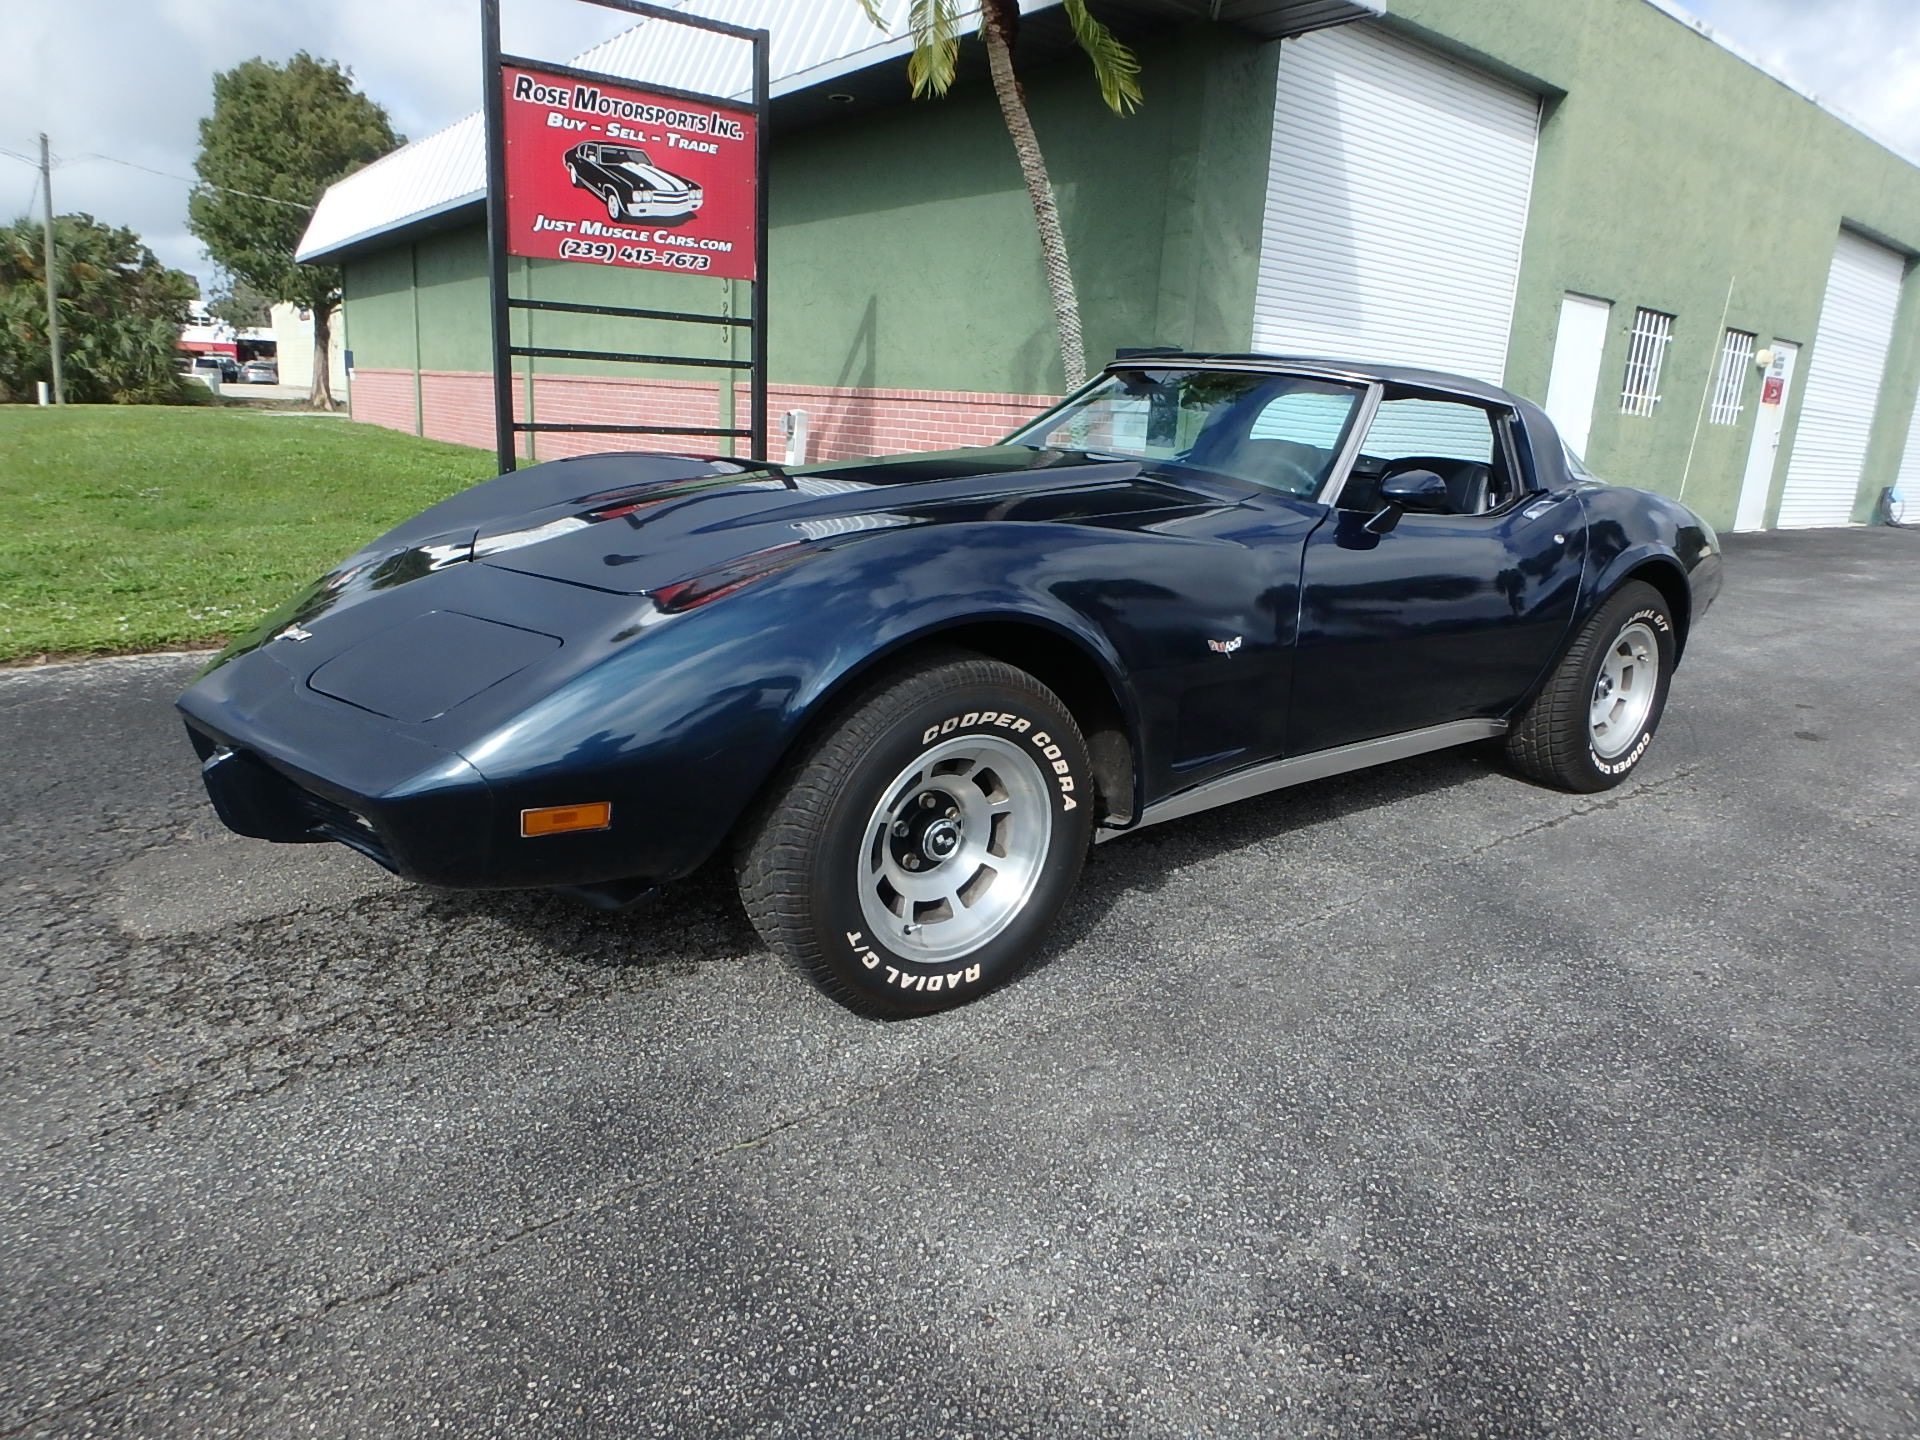 Used 1979 Chevy Corvette Stingray